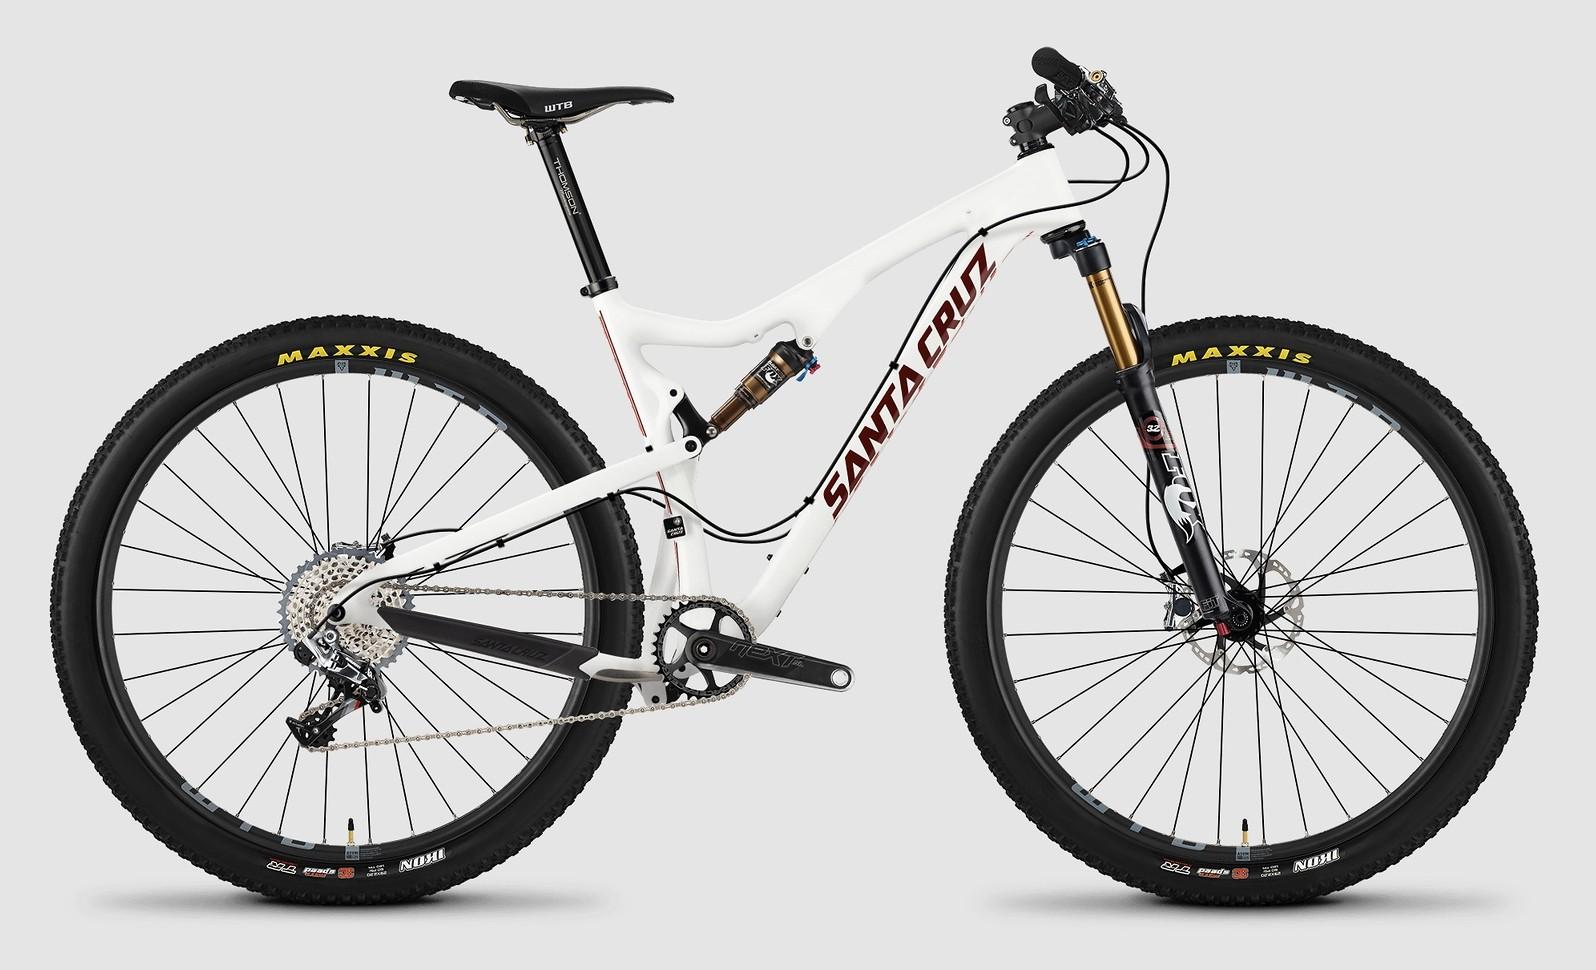 2015 Santa Cruz Tallboy Carbon C XX1 bike - white